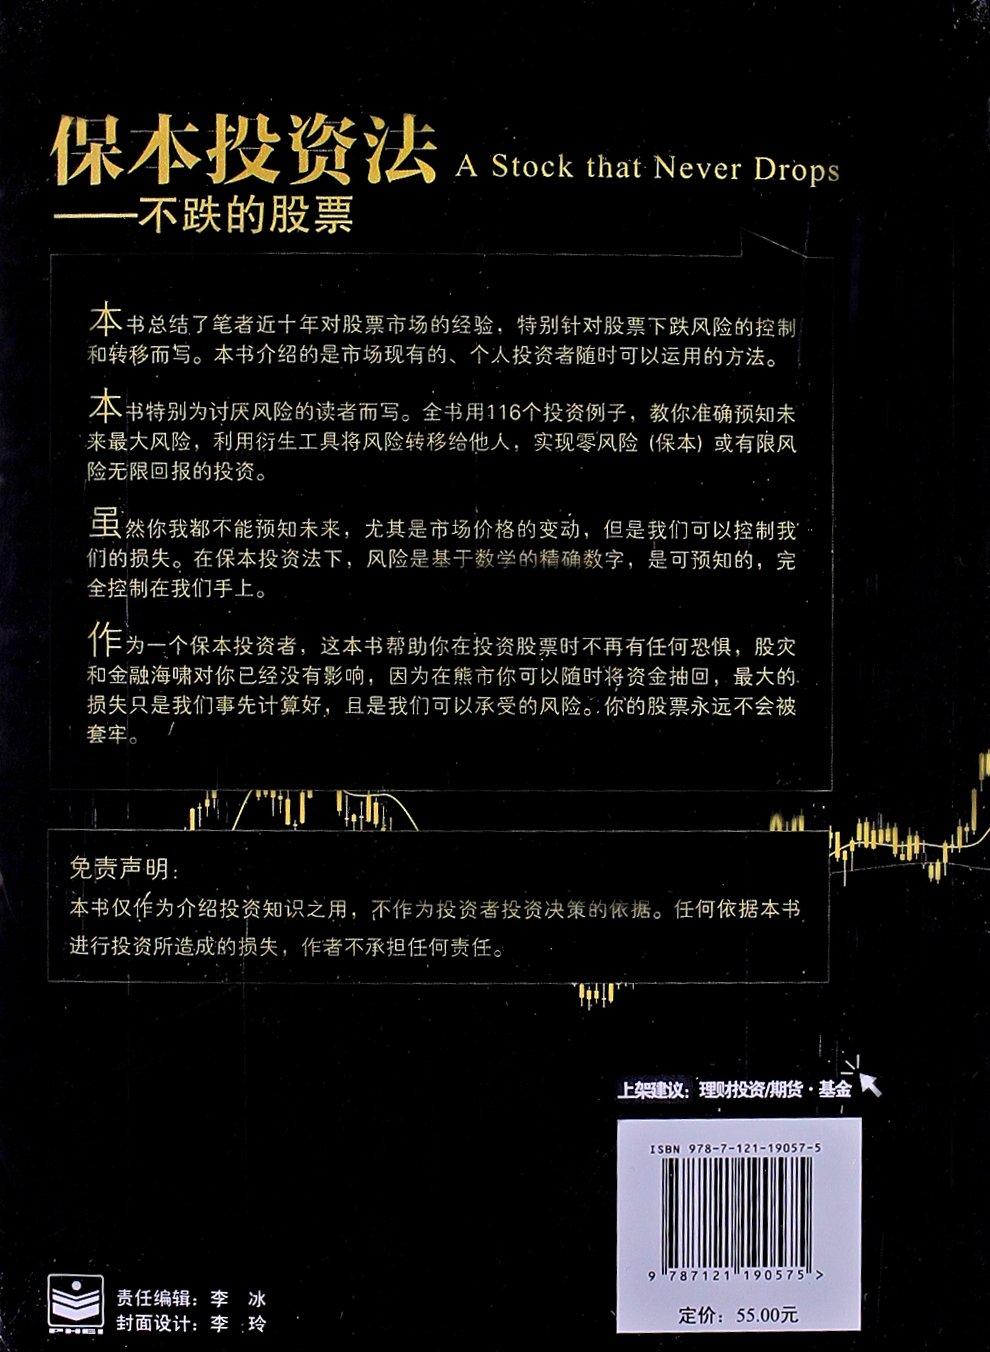 Amazon.com: 保本投资法——不跌的股票(献给厌恶风险的投资者 ...